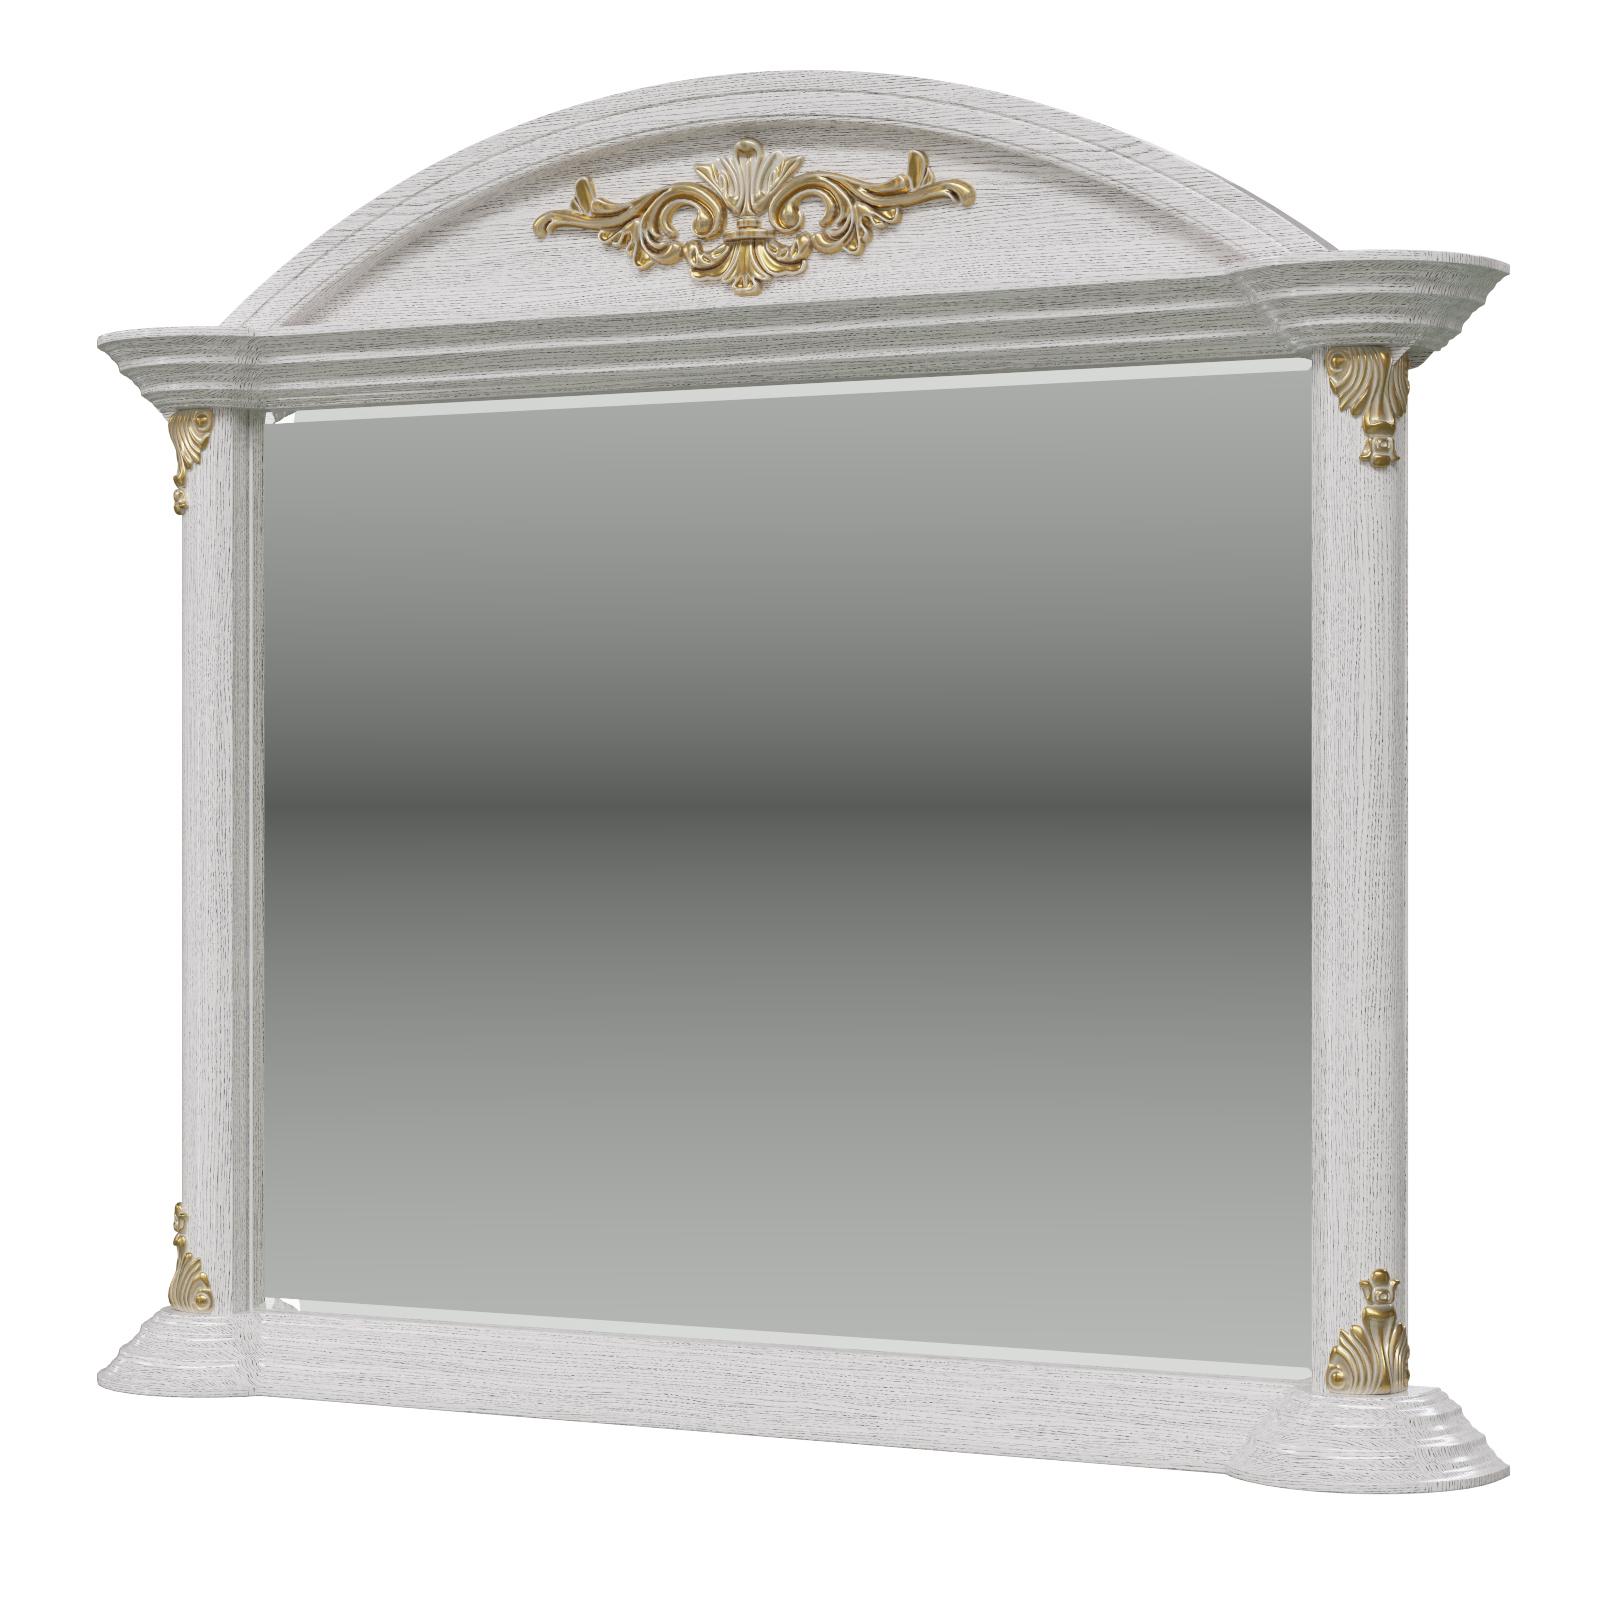 Зеркало Мэри-Мебель Да Винчи ГД-07 патина белый, 121х13х105 см. фото